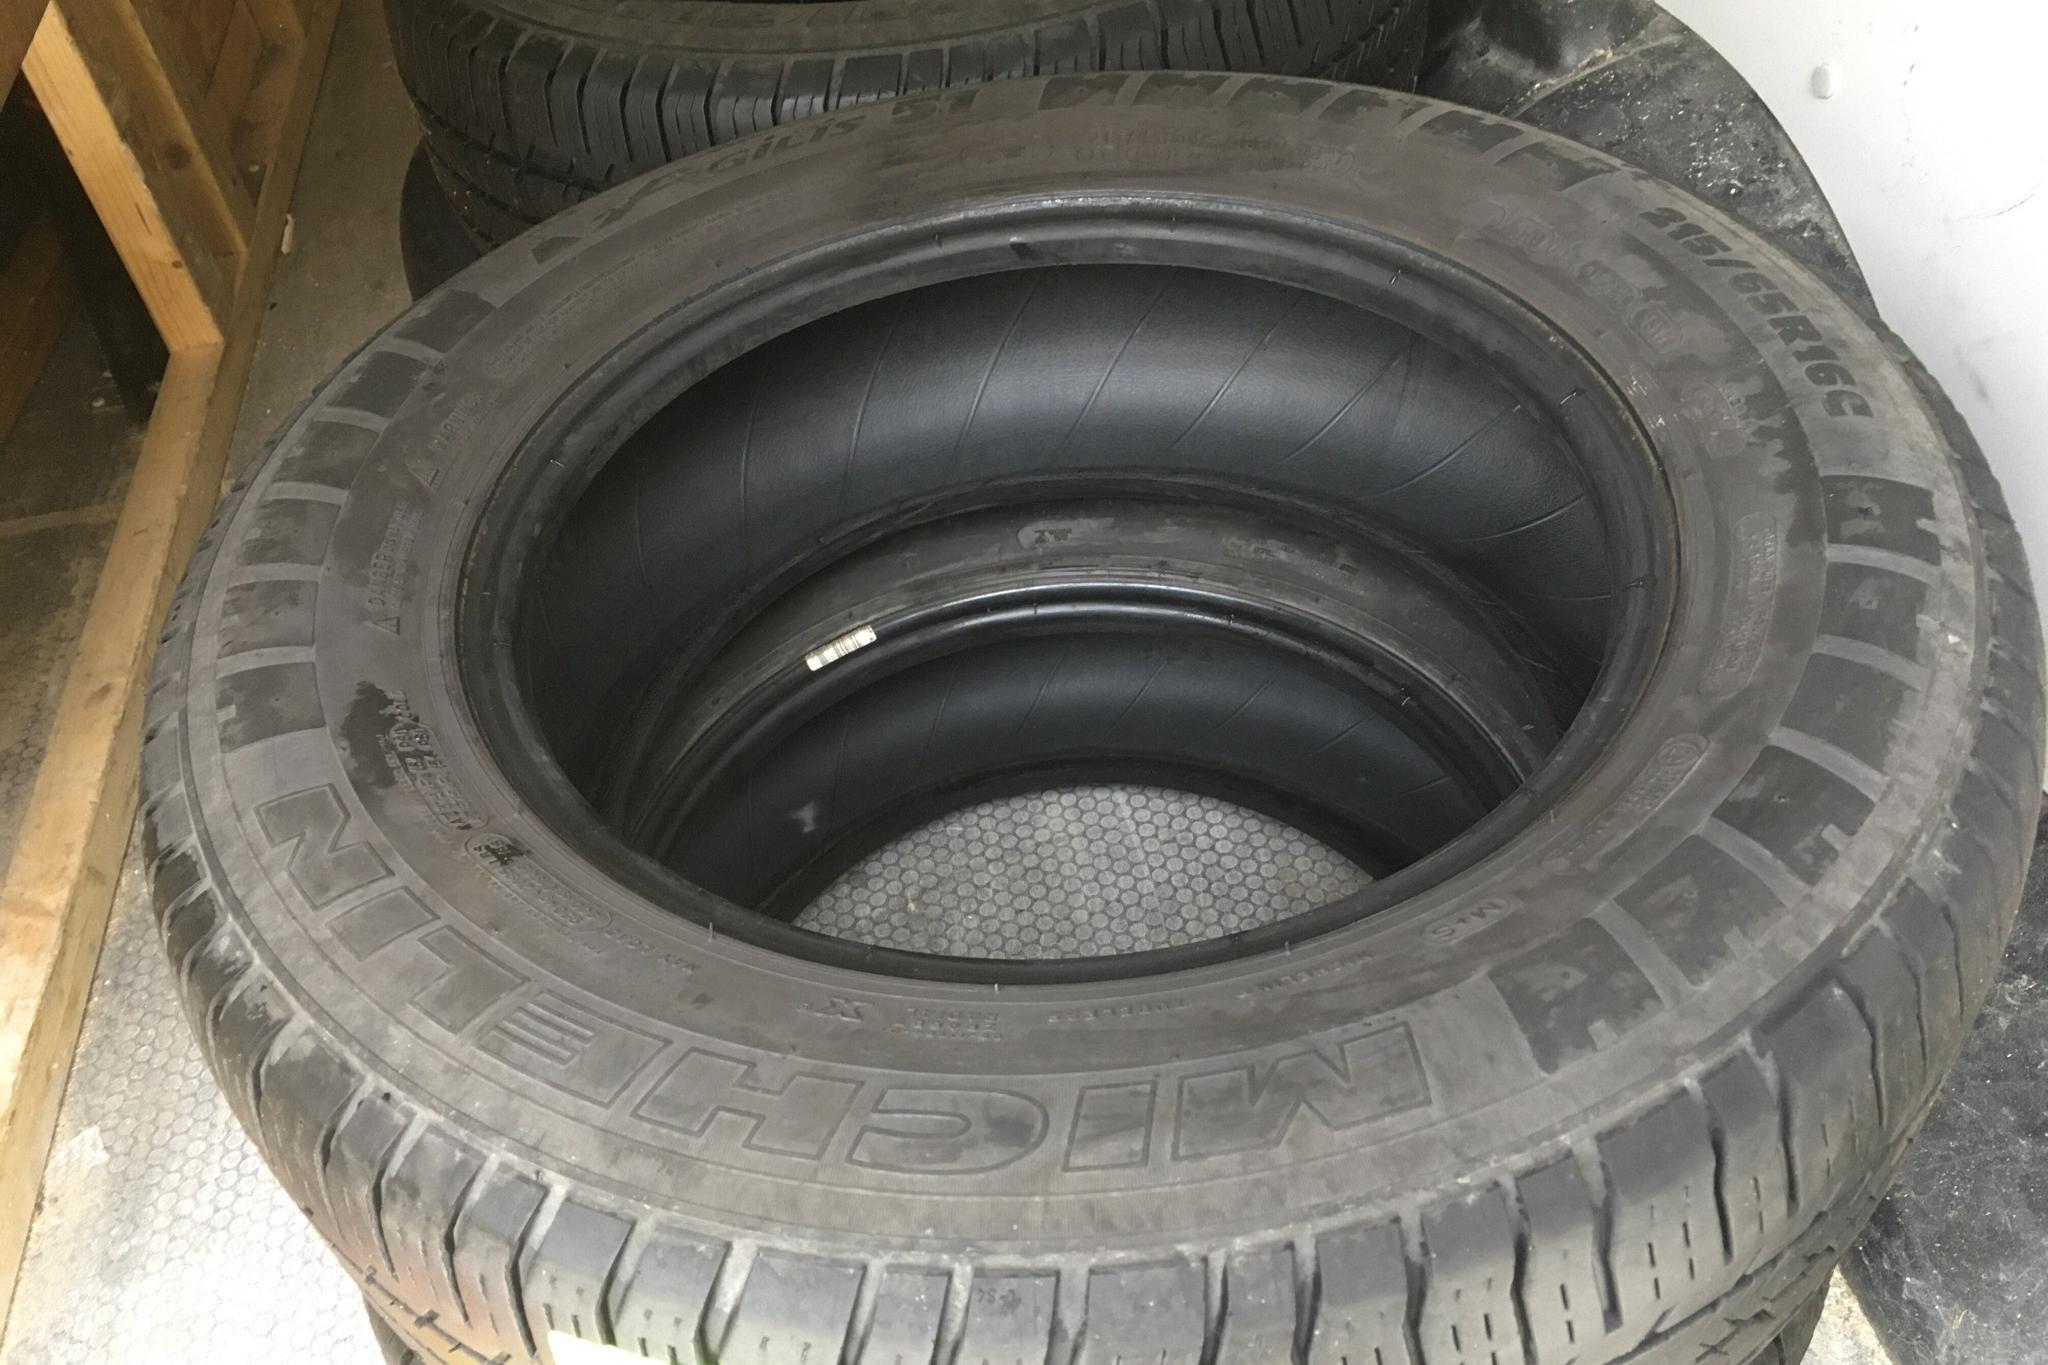 Toyota PROACE 2.0D (120hk) - 7 931 mil - Manuell - svart - 2018